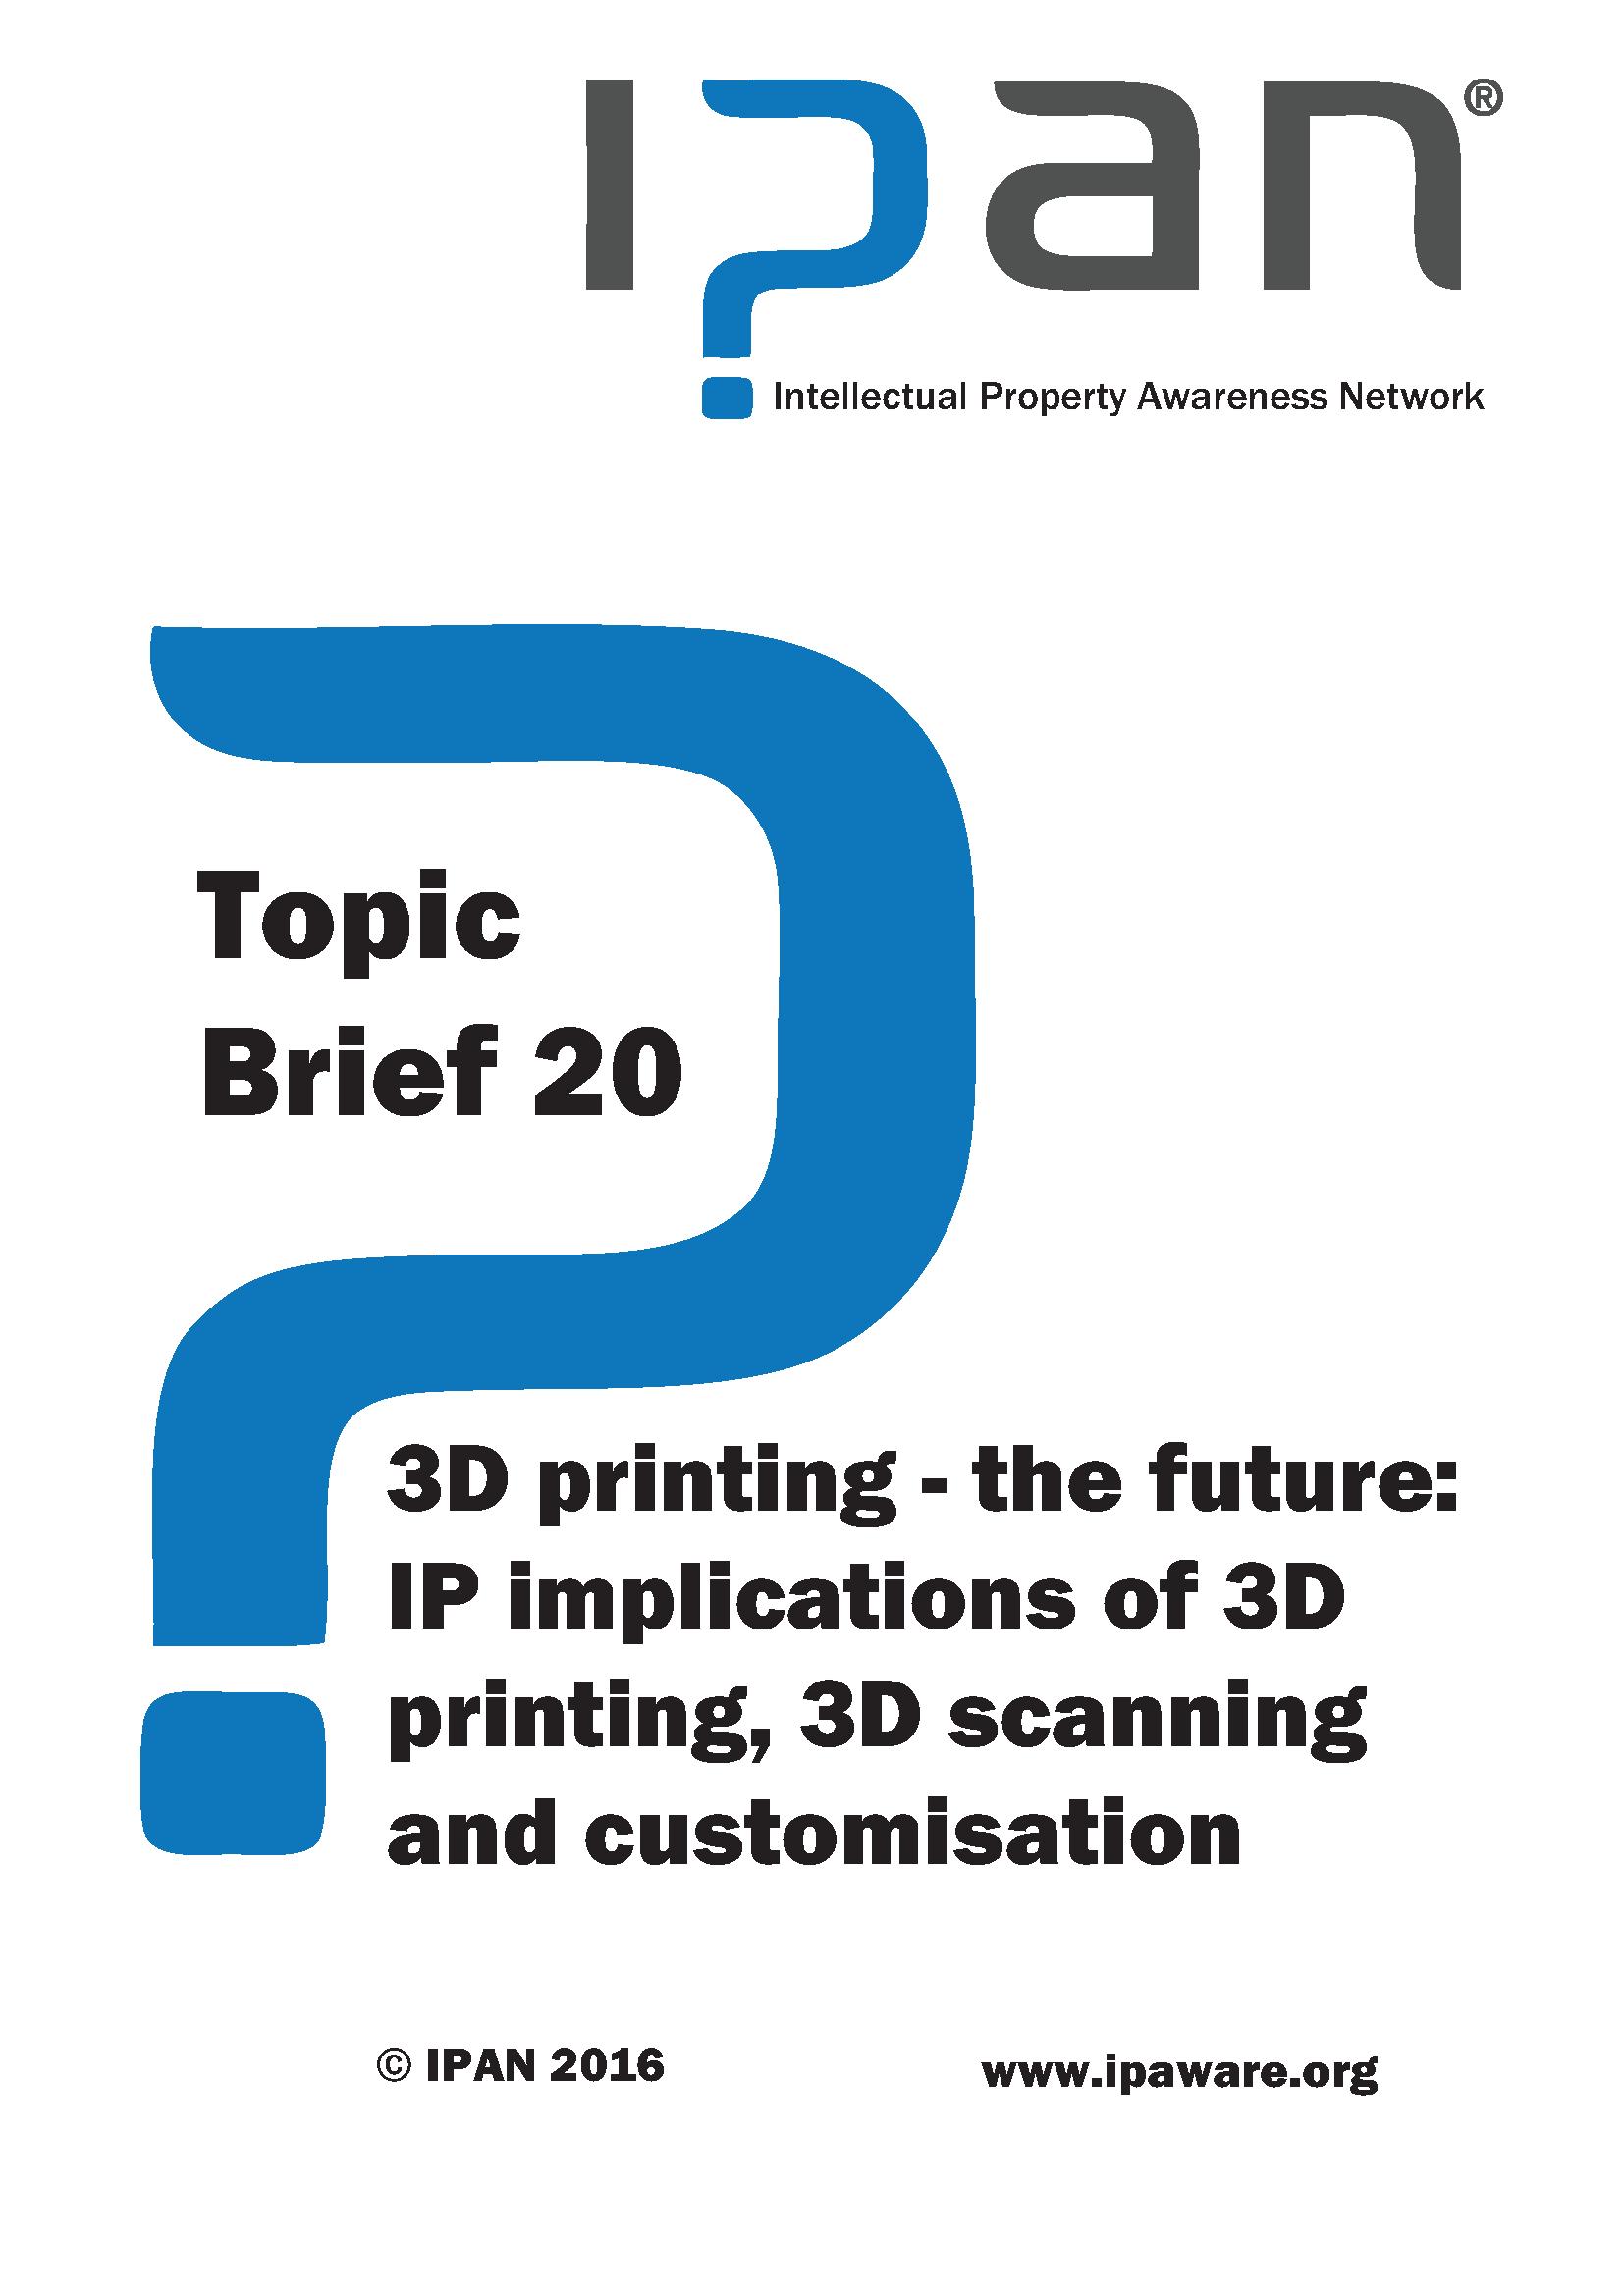 3D printing - IP implications